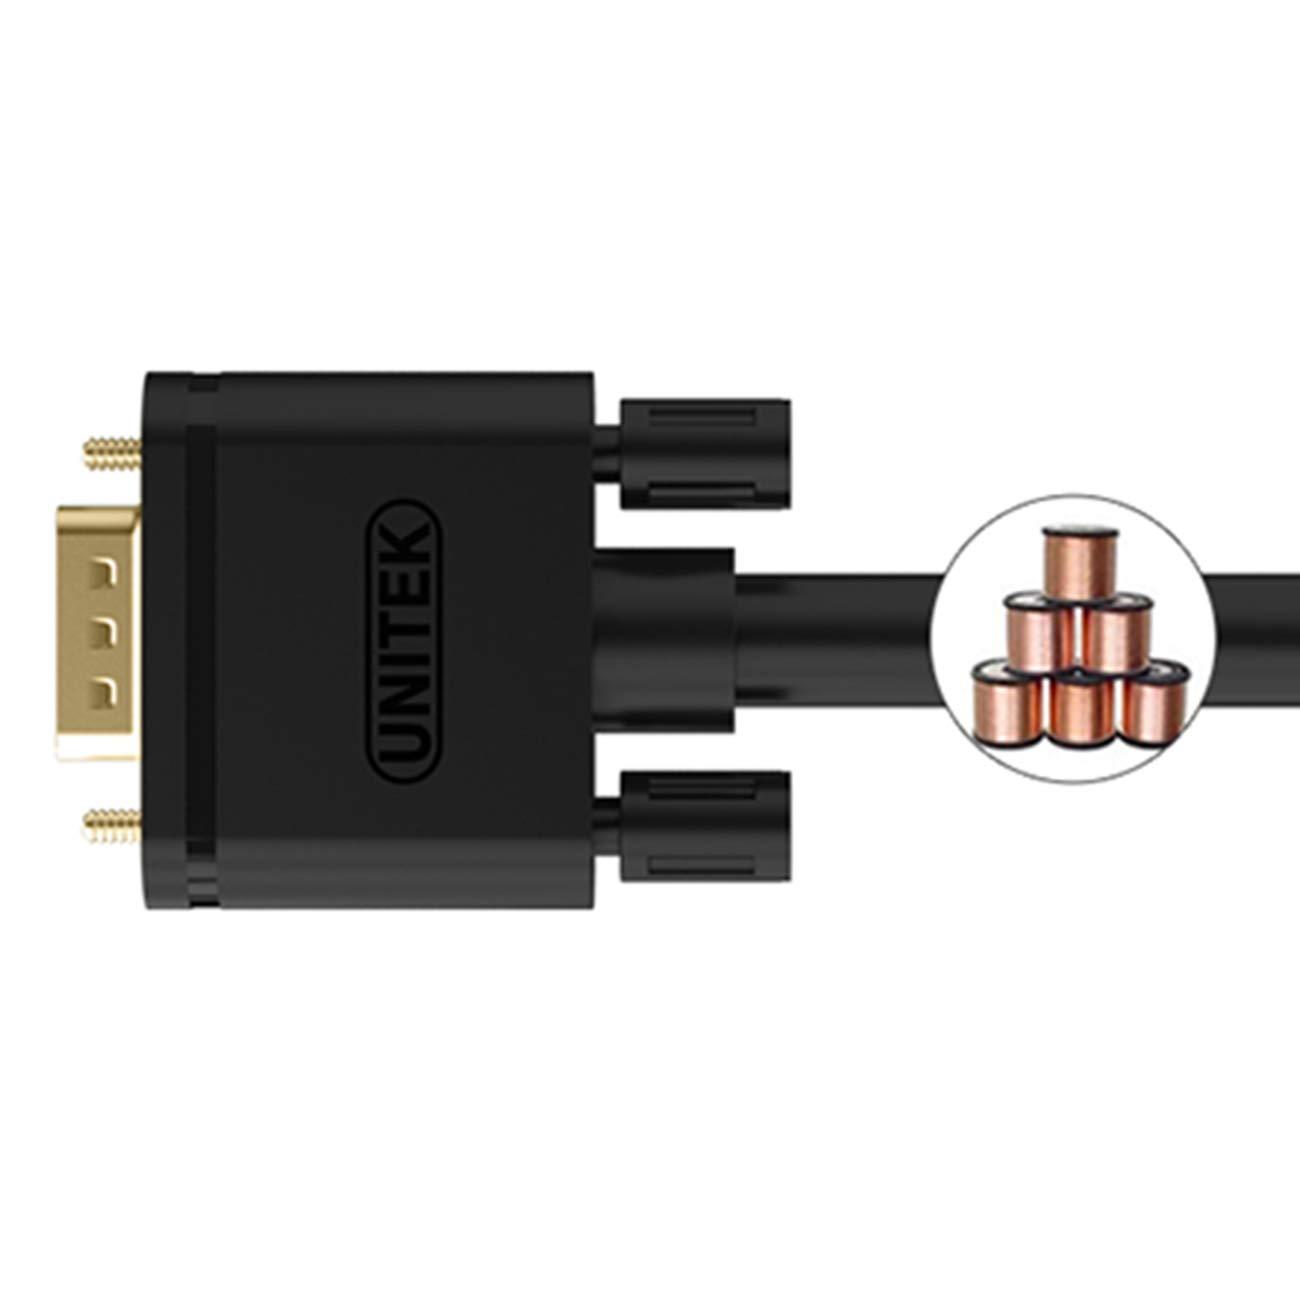 Unitek VGA 10m Kabel Displays Y-C506G Hdtvs kompatibel f/ür Projektoren 1080P VGA//SVGA Video Monitor coaxial Verl/ängerungskabel HD mit 2 ferritfilter//vergoldeten Kontakte//15-polig HD Stecker